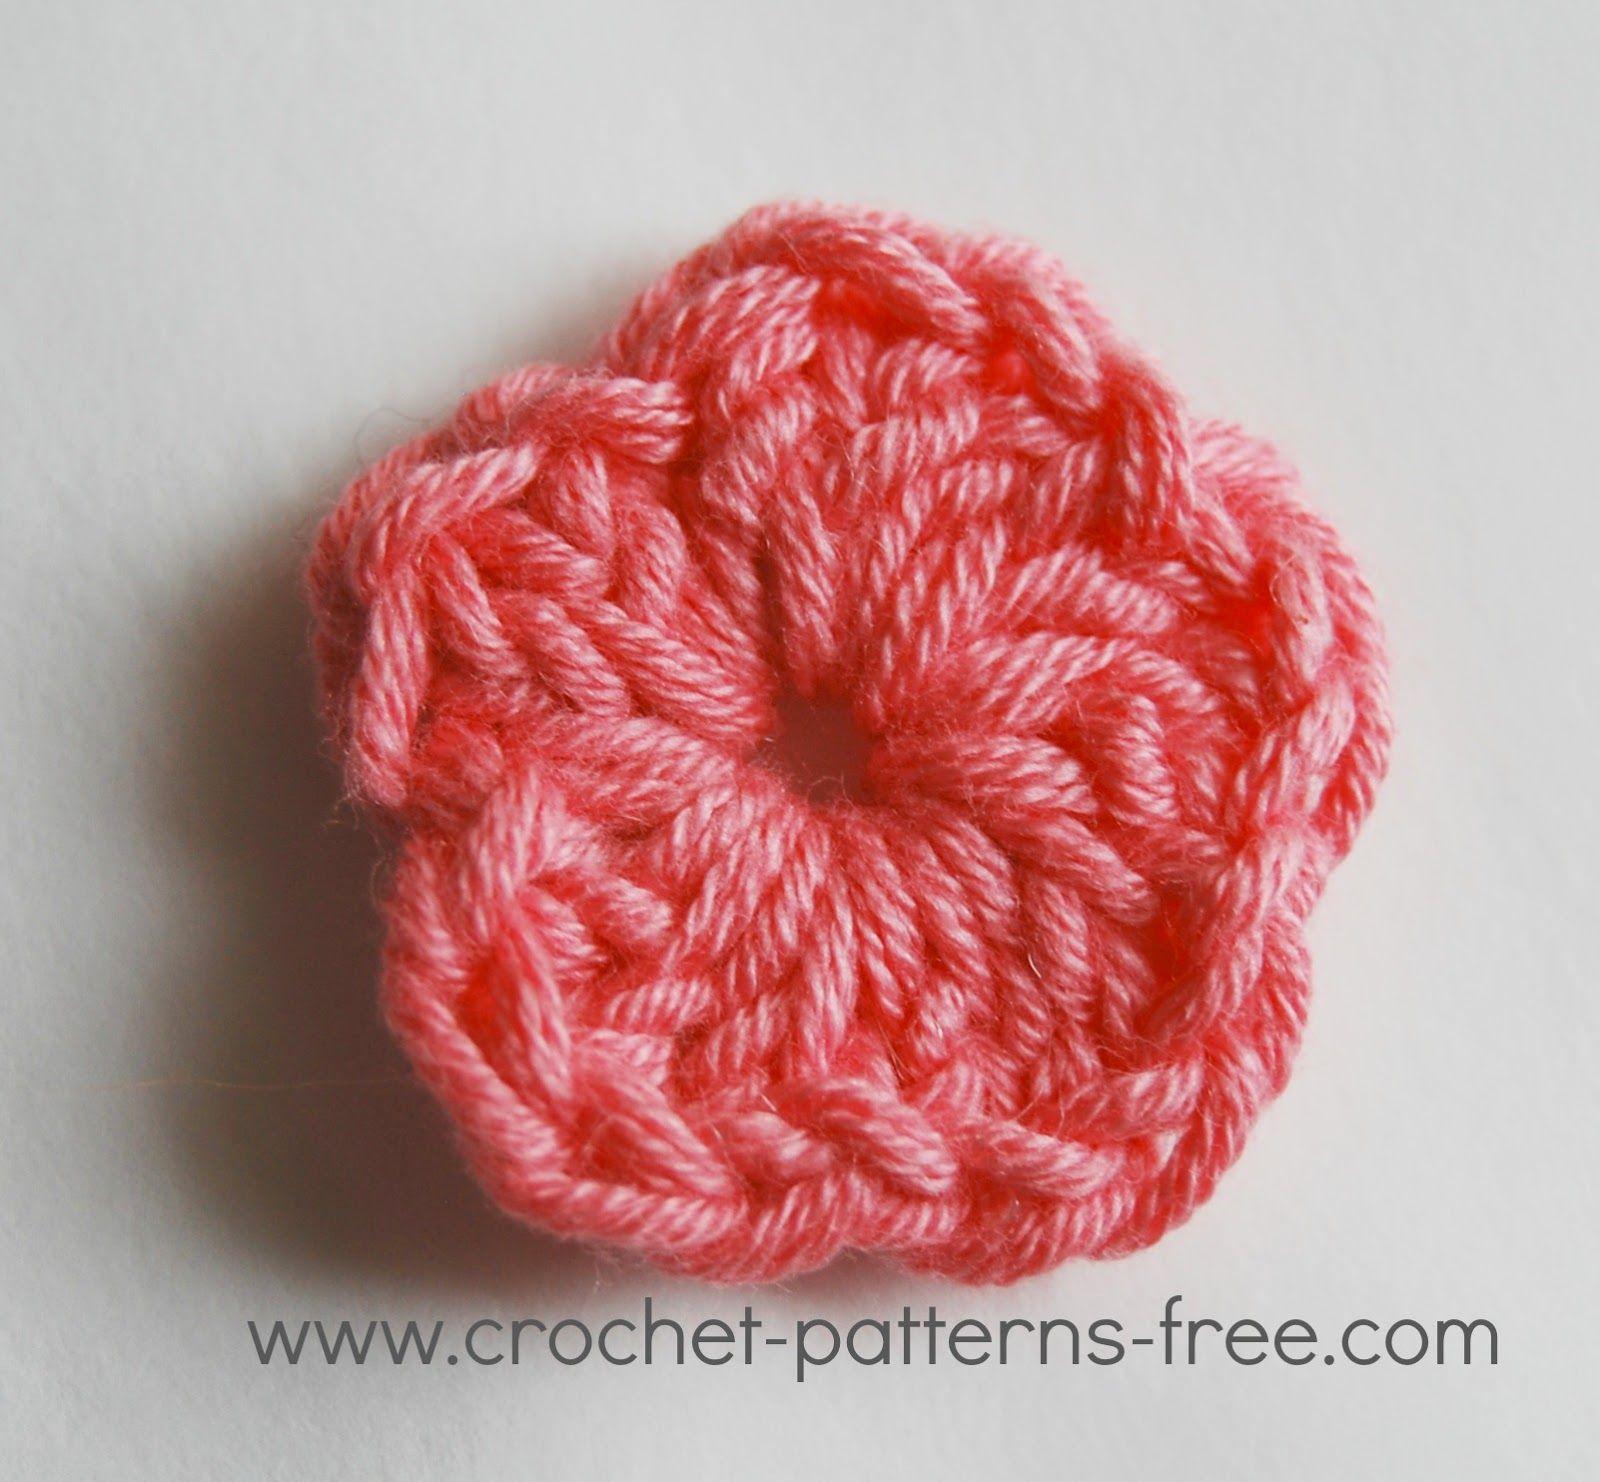 3 small crochet flower free patterns nannies hands pinterest 3 small crochet flower free patterns bankloansurffo Gallery